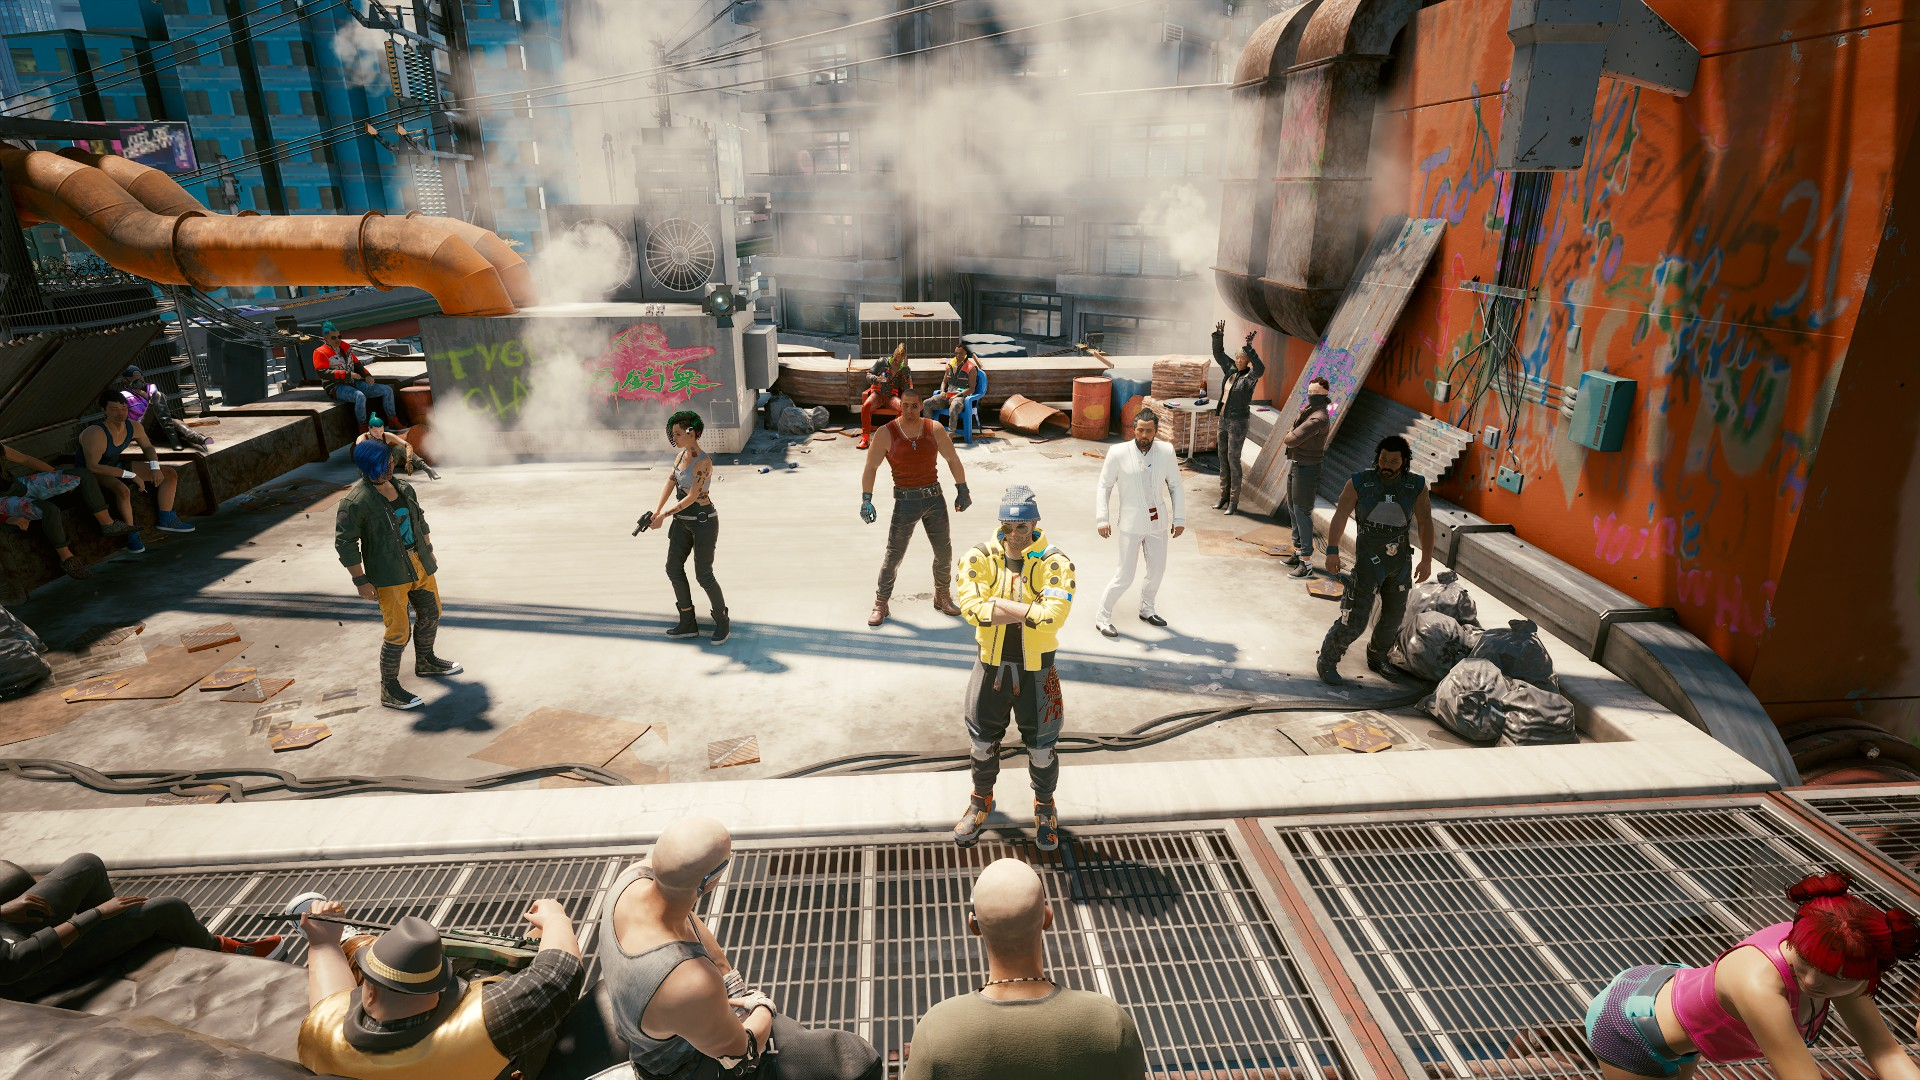 Cyberpunk 2077: Mod ใหม่เอาใจสายขี้เหงา ทำให้ V มีเพื่อน NPC ติดตามตลอดเวลา